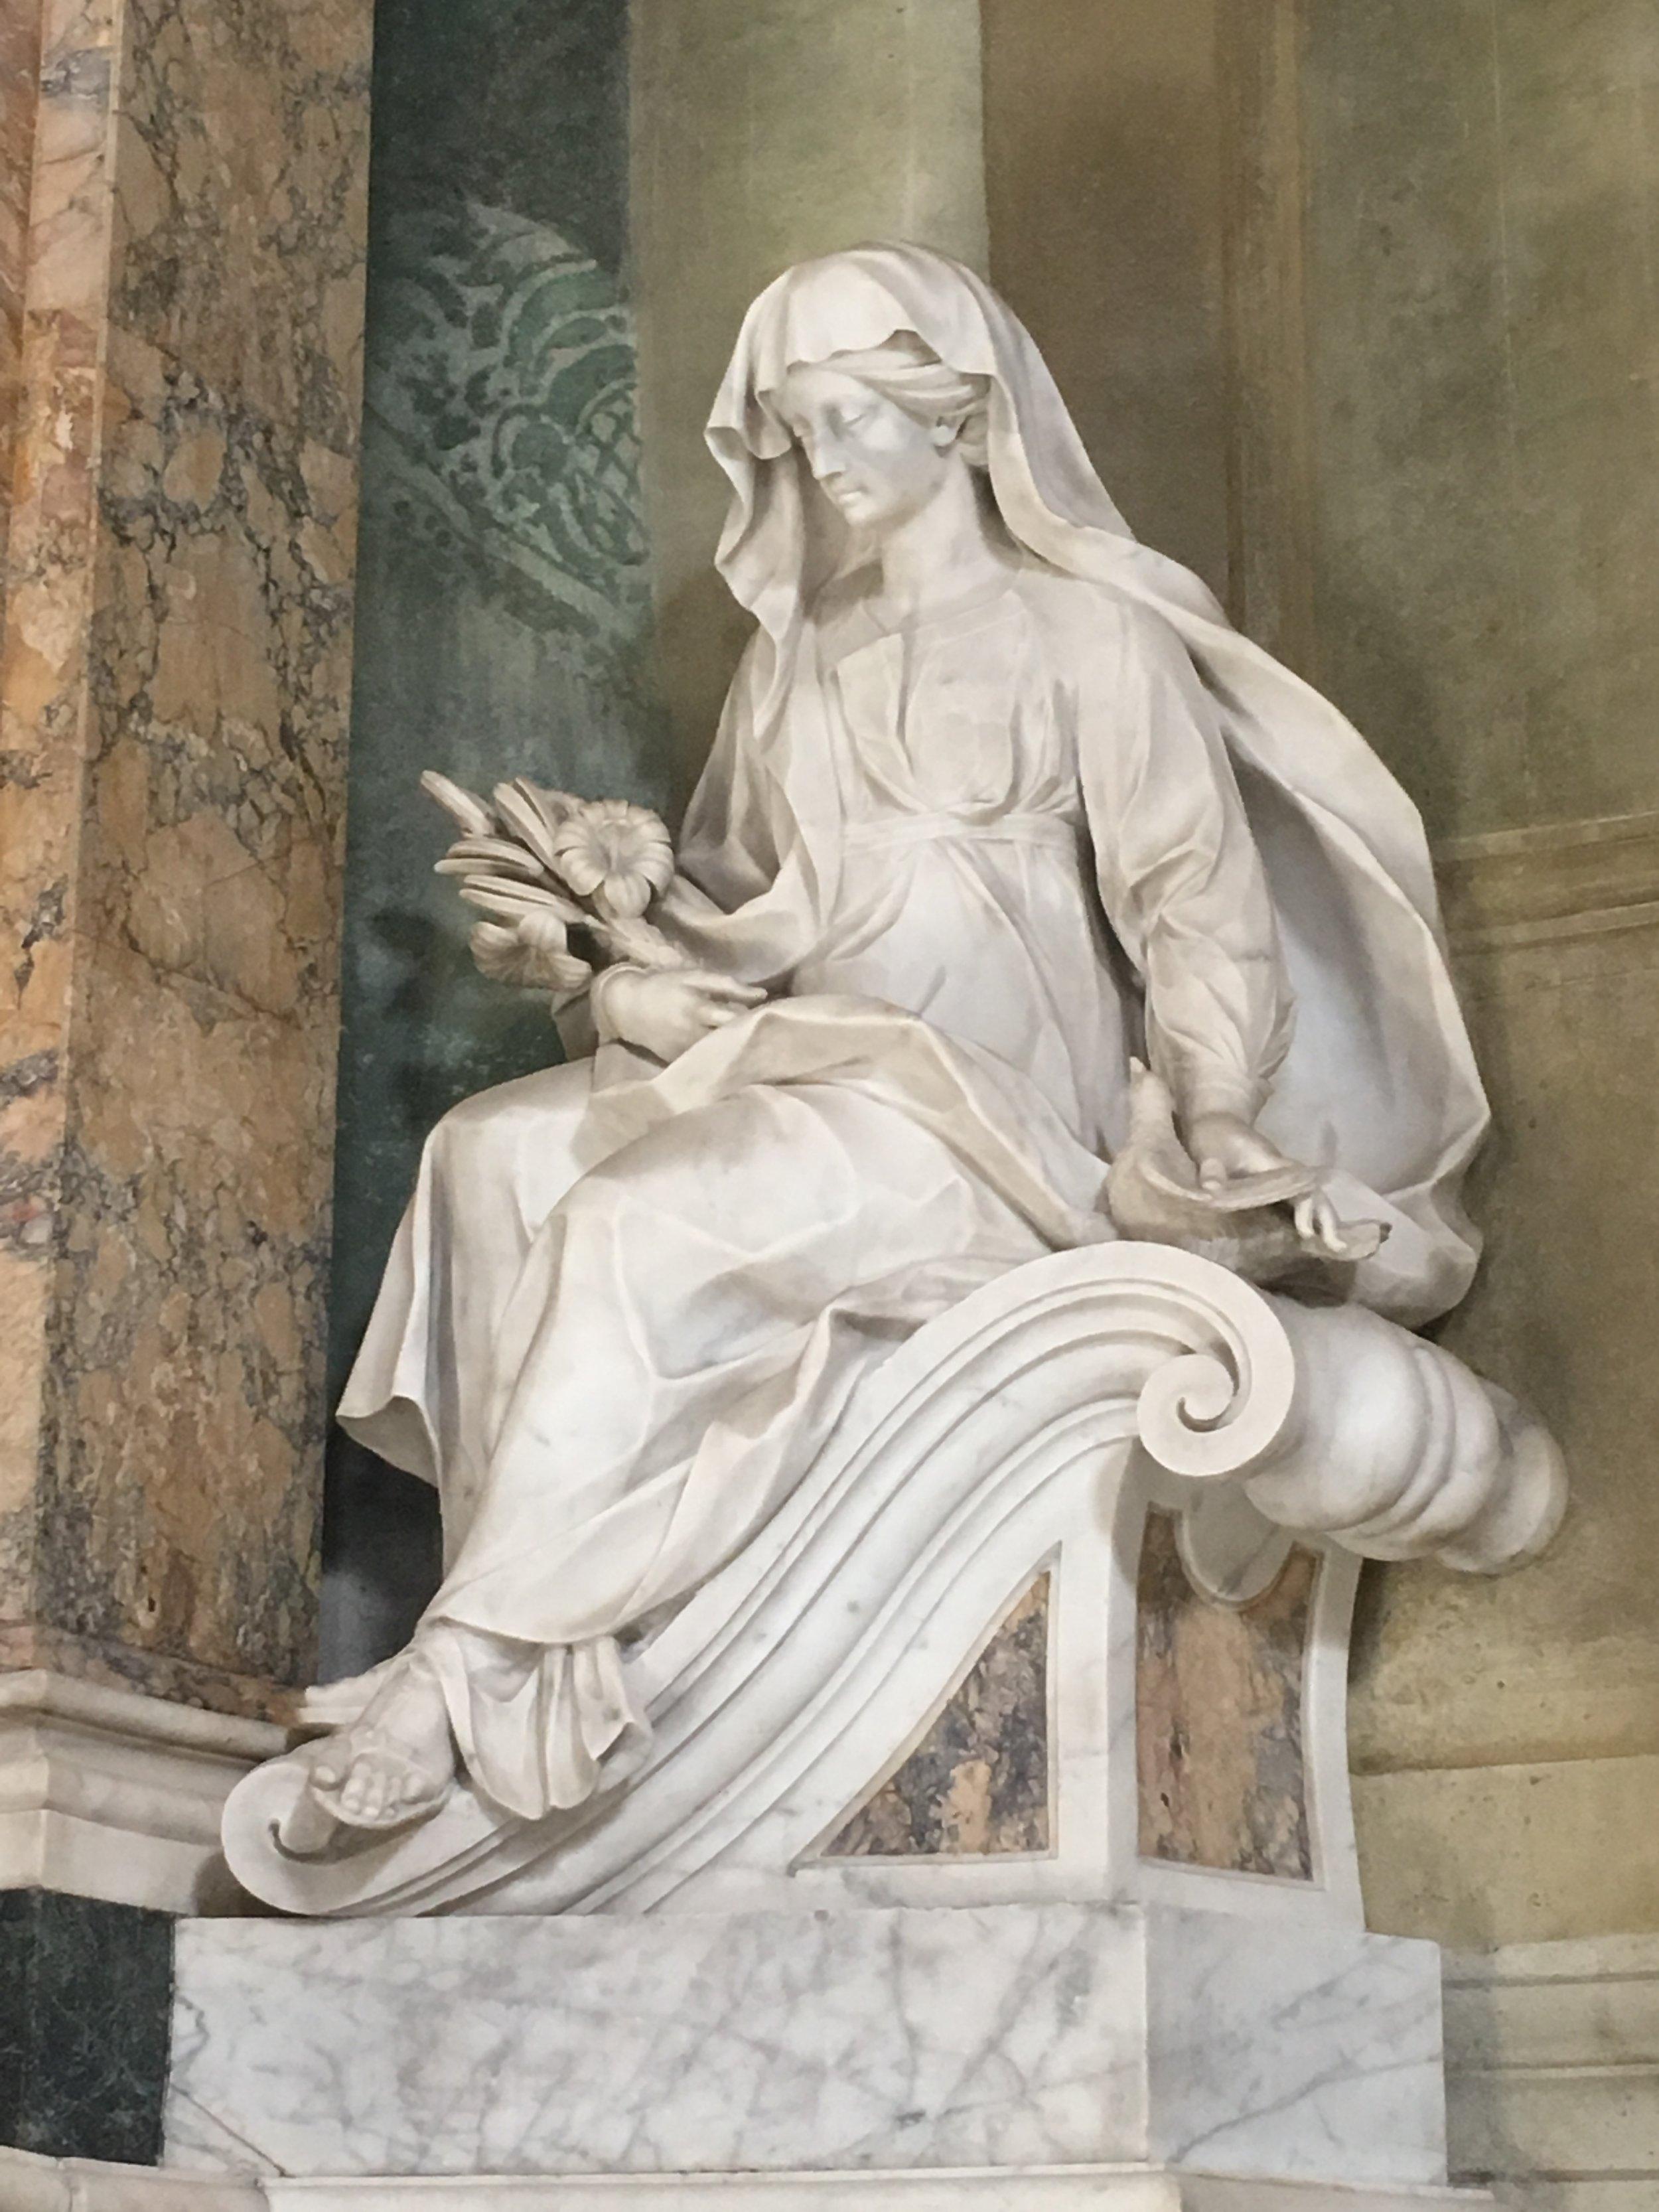 Statue, Chiesa di Santa Caterina